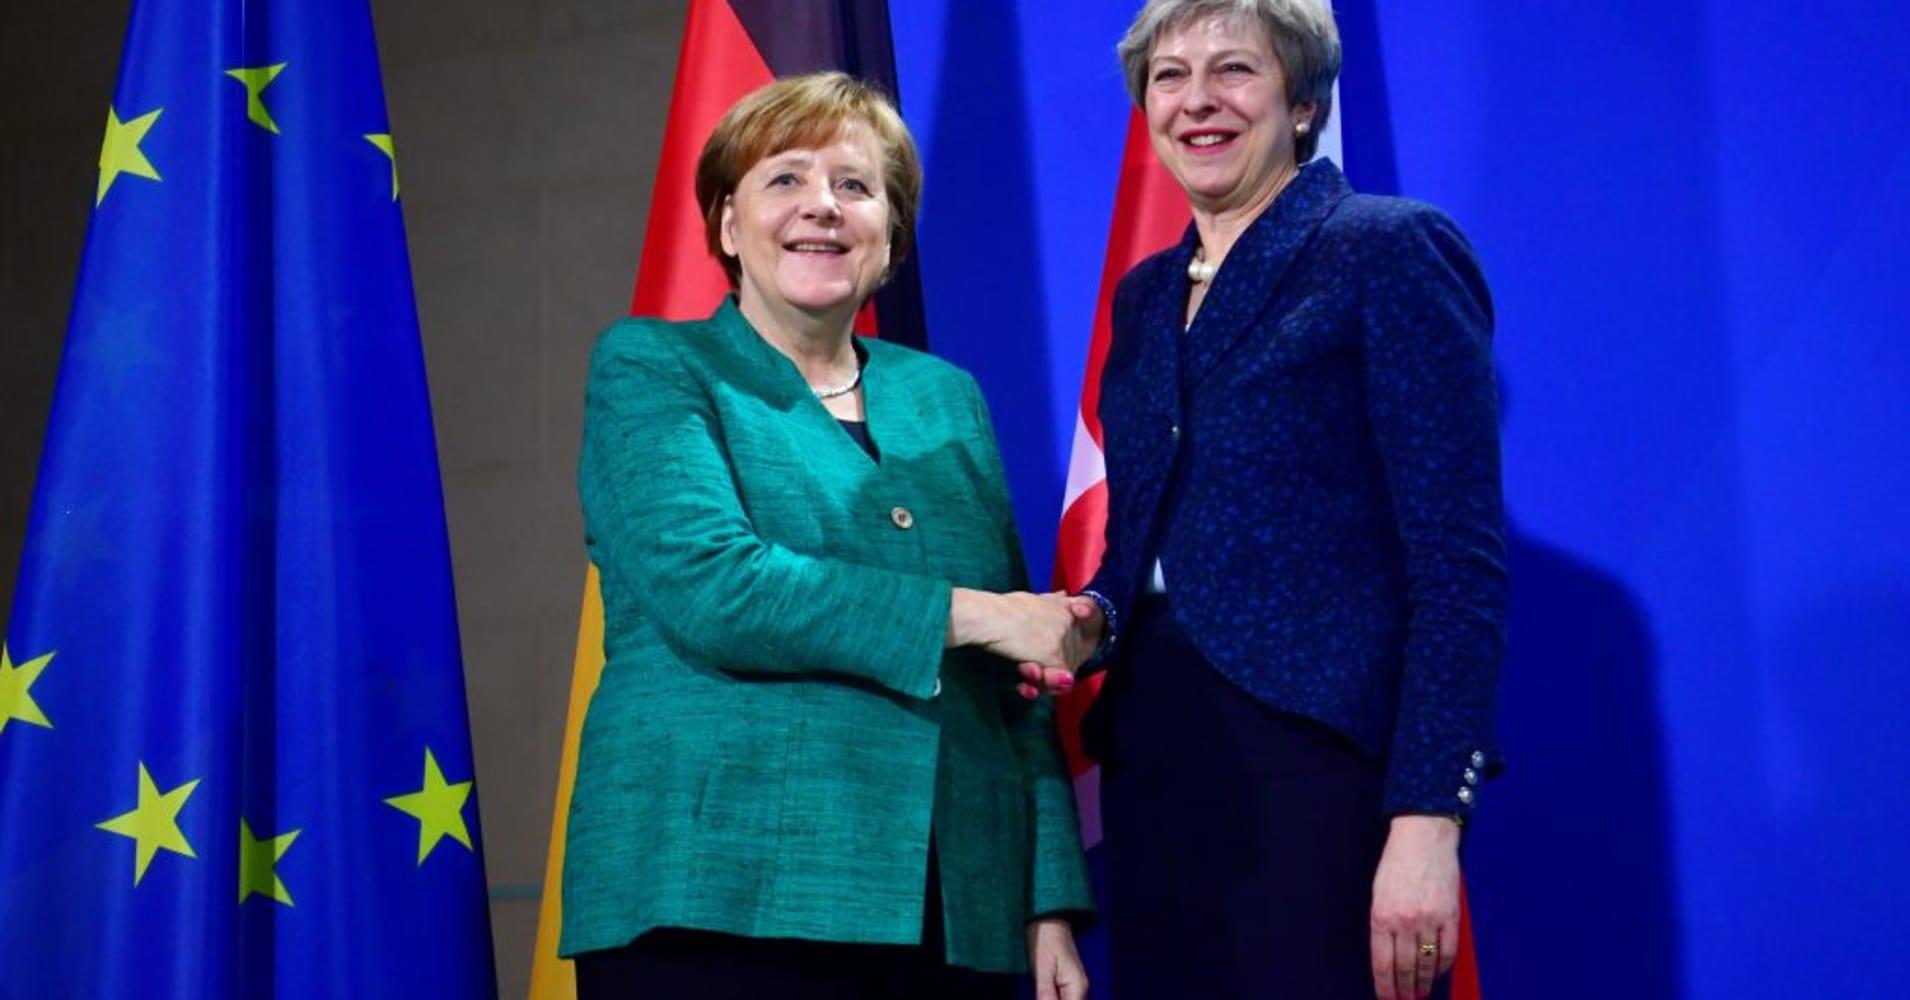 Brexit deal should strike 'fair balance,' says Germany's Merkel